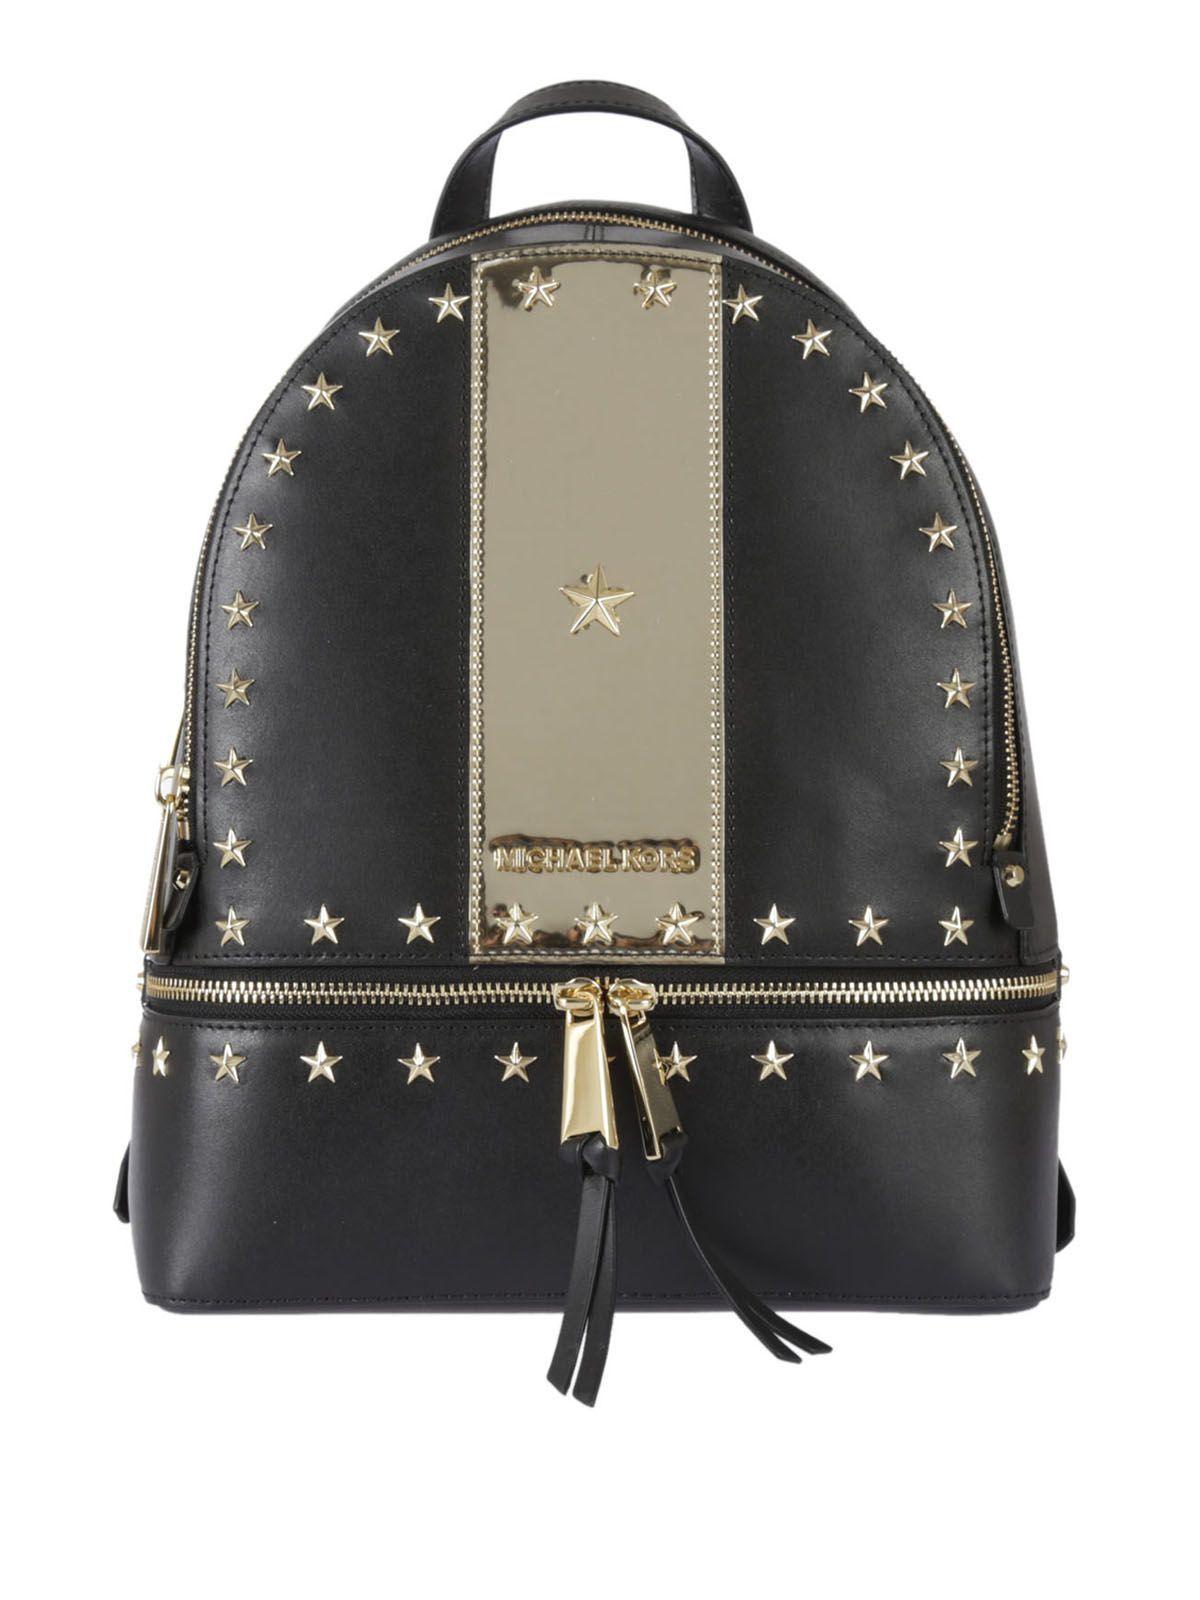 9037bd41d91e MICHAEL KORS MICHAEL MICHAEL KORS MEDIUM RHEA STAR STUD BACKPACK. # michaelkors #bags #leather #backpacks #